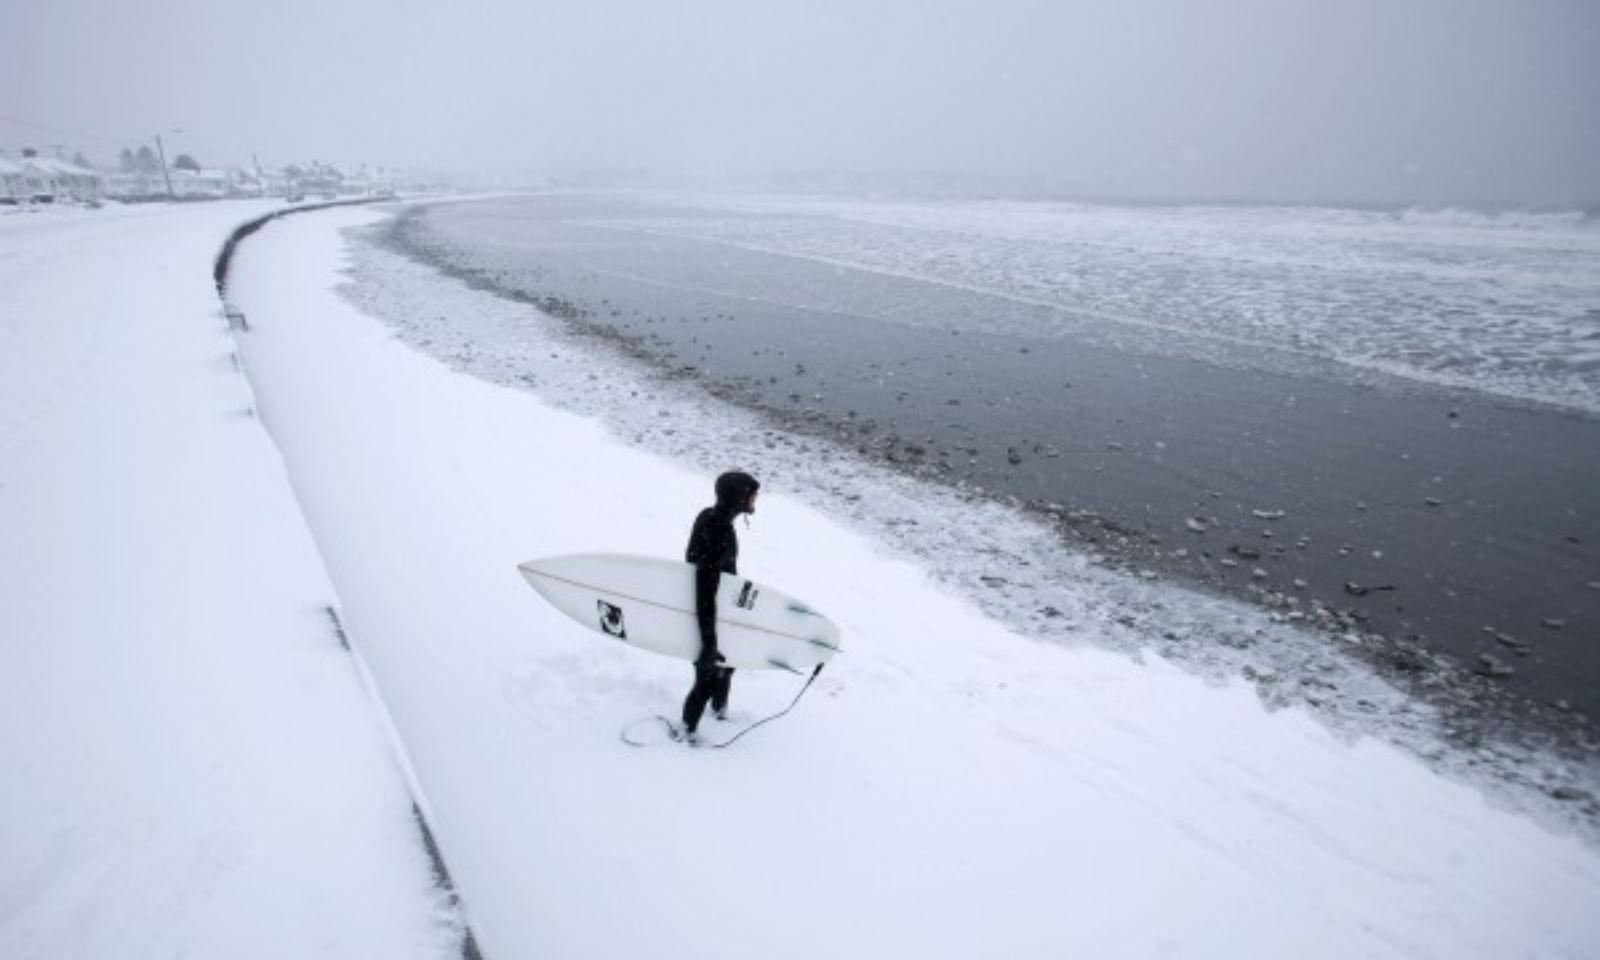 winter surfing italia